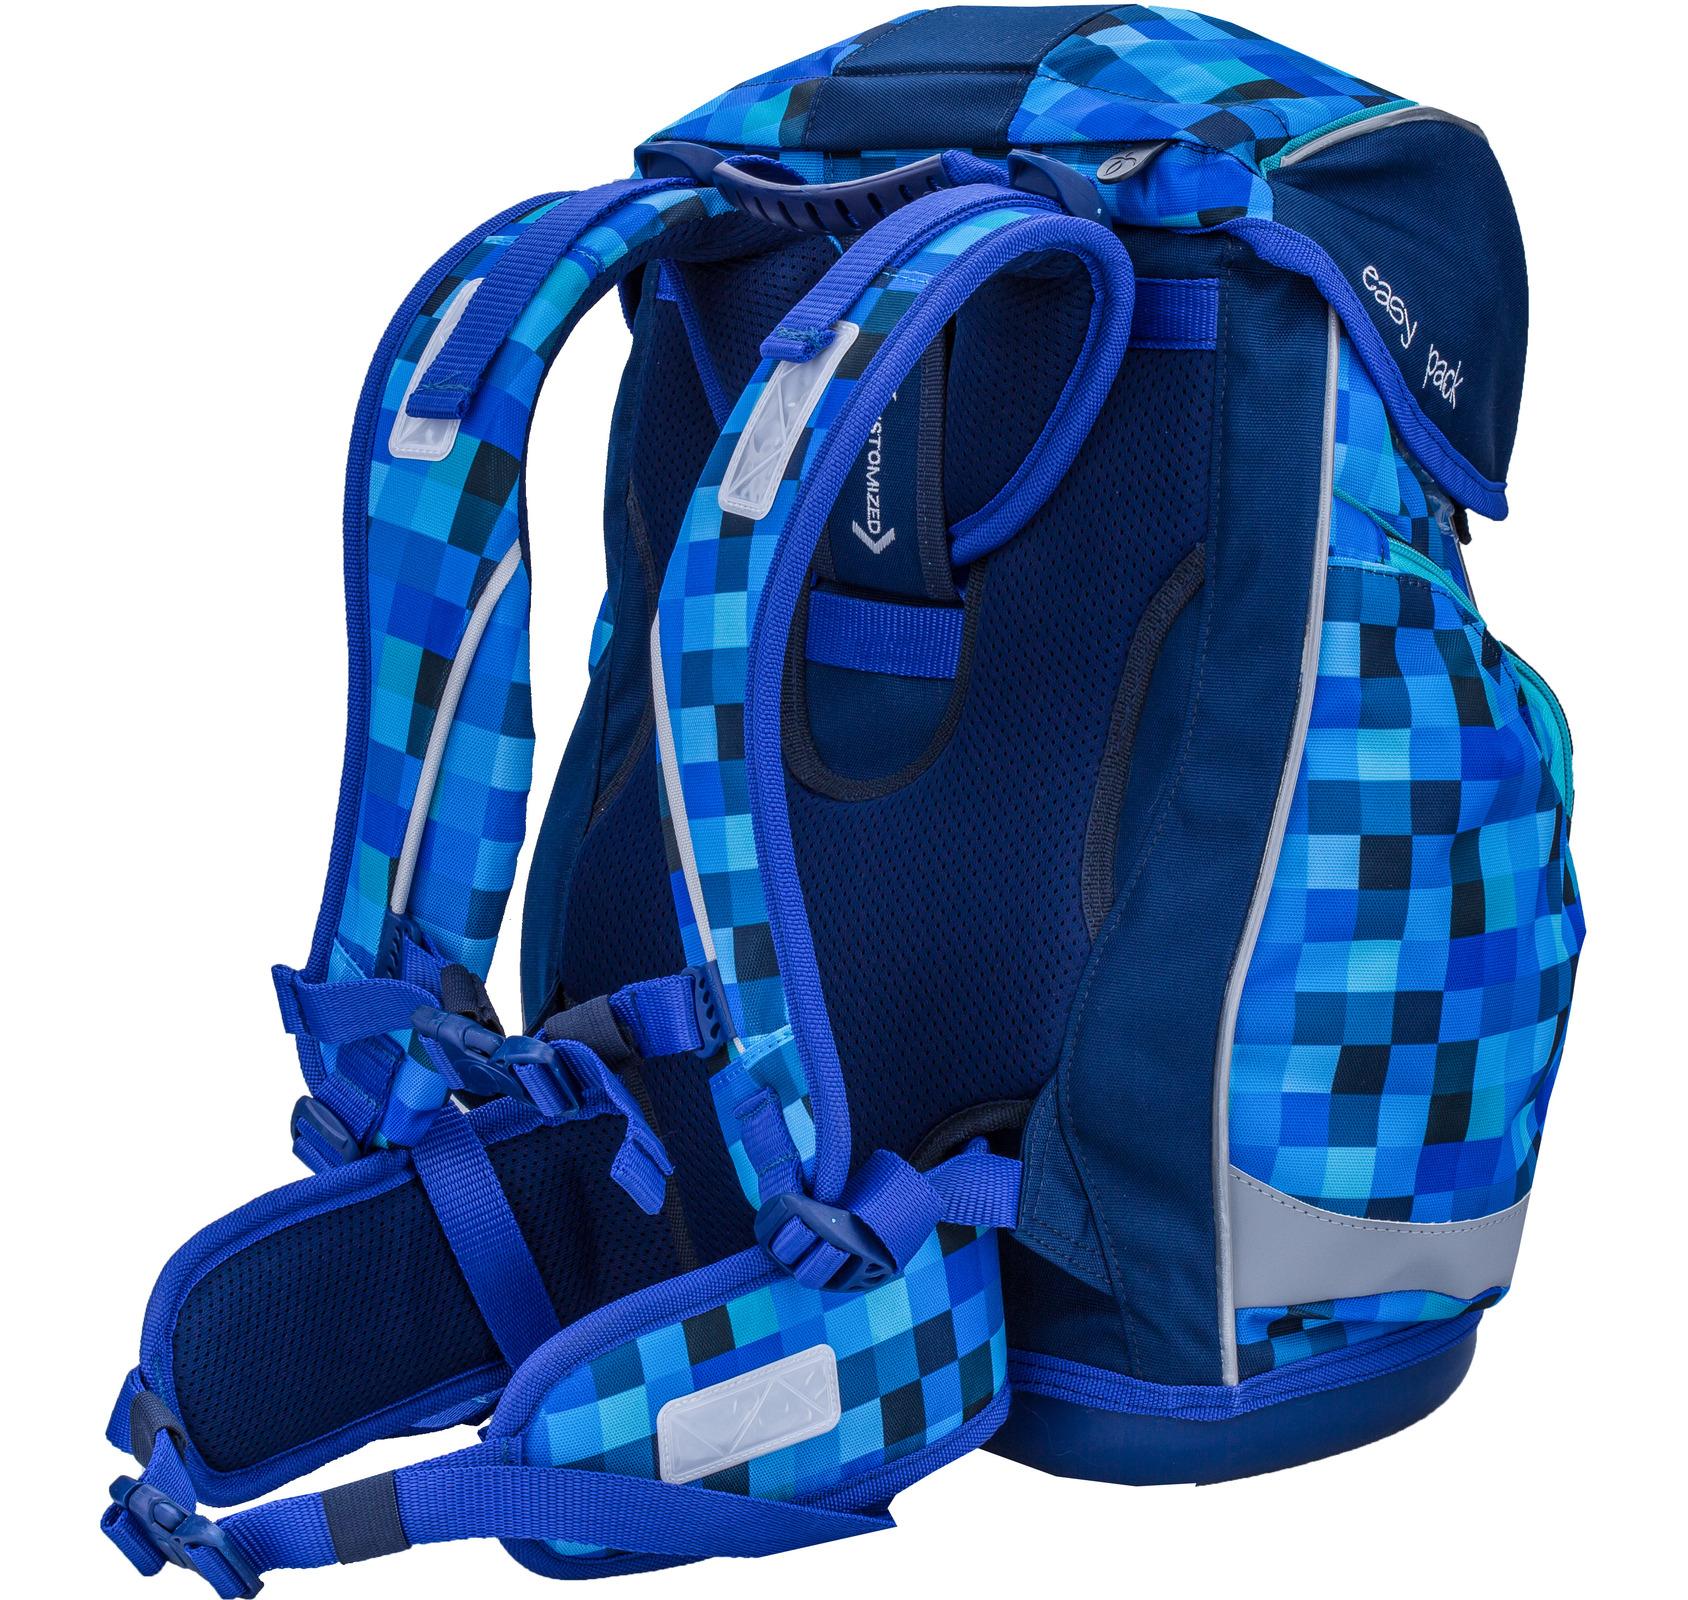 Ранец Belmil EASY PACK 404-40 BLUE PACK + мешок, - фото 5